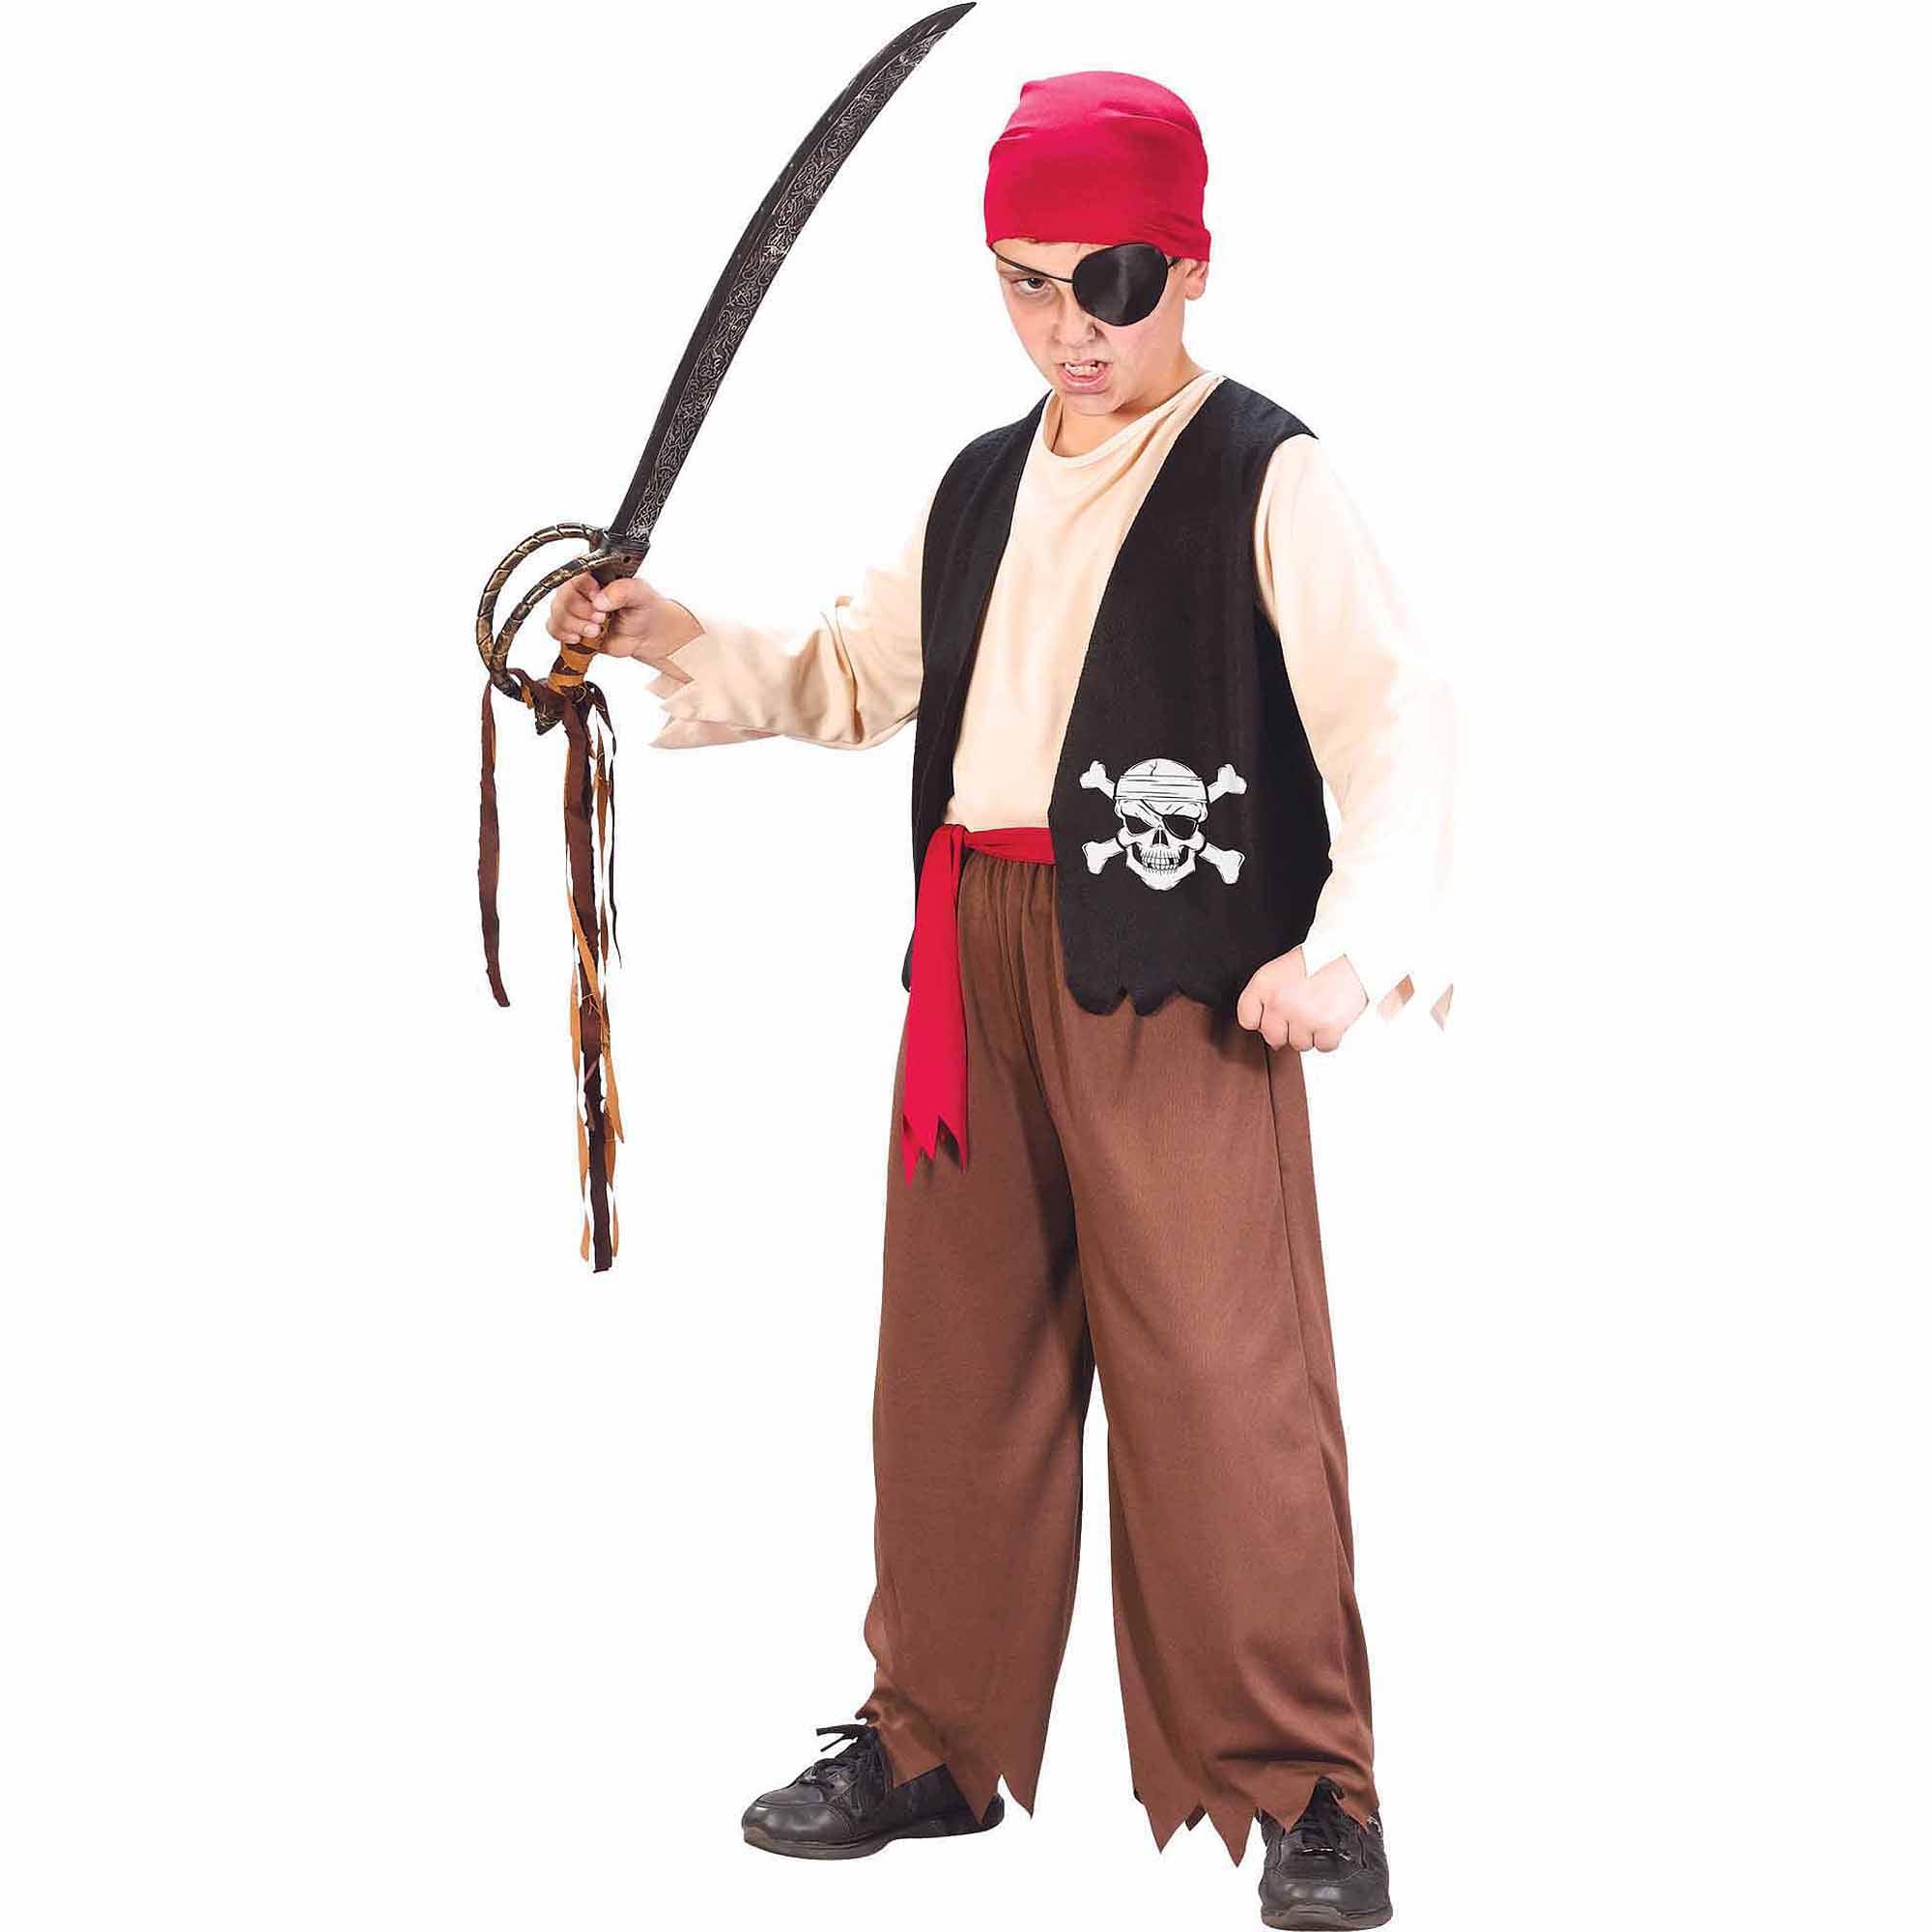 Playful Pirate Child Halloween Costume by Fun World